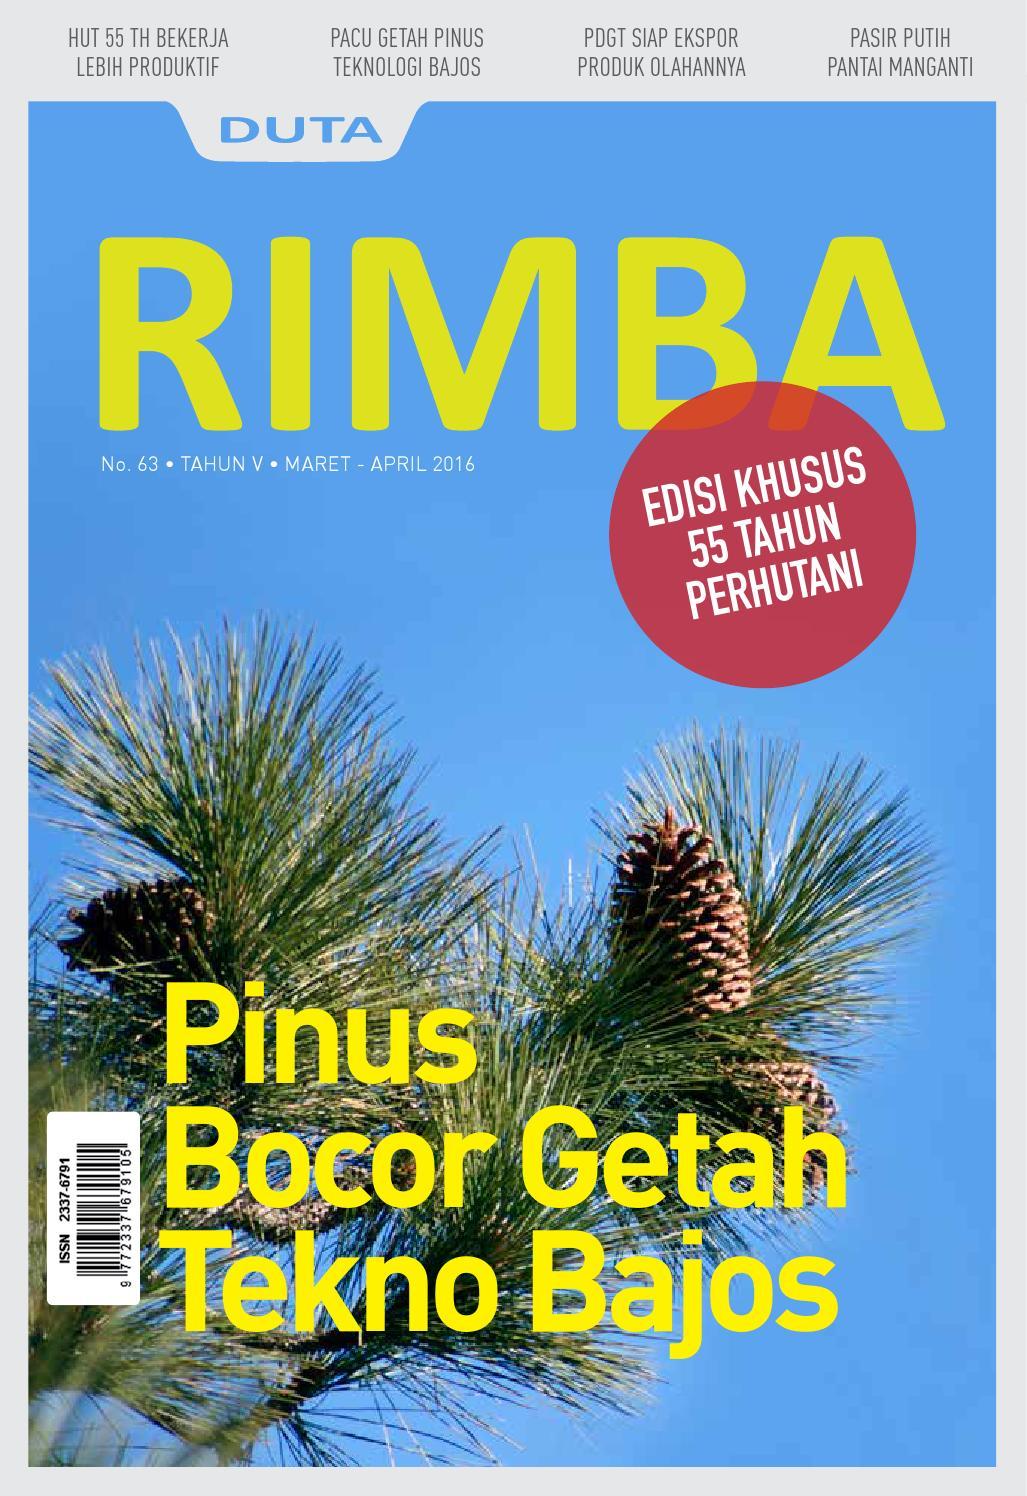 Duta Rimba Edisi 63 Maret April 2016 By Perhutani Issuu Produk Ukm Bumn Sambal Legenda